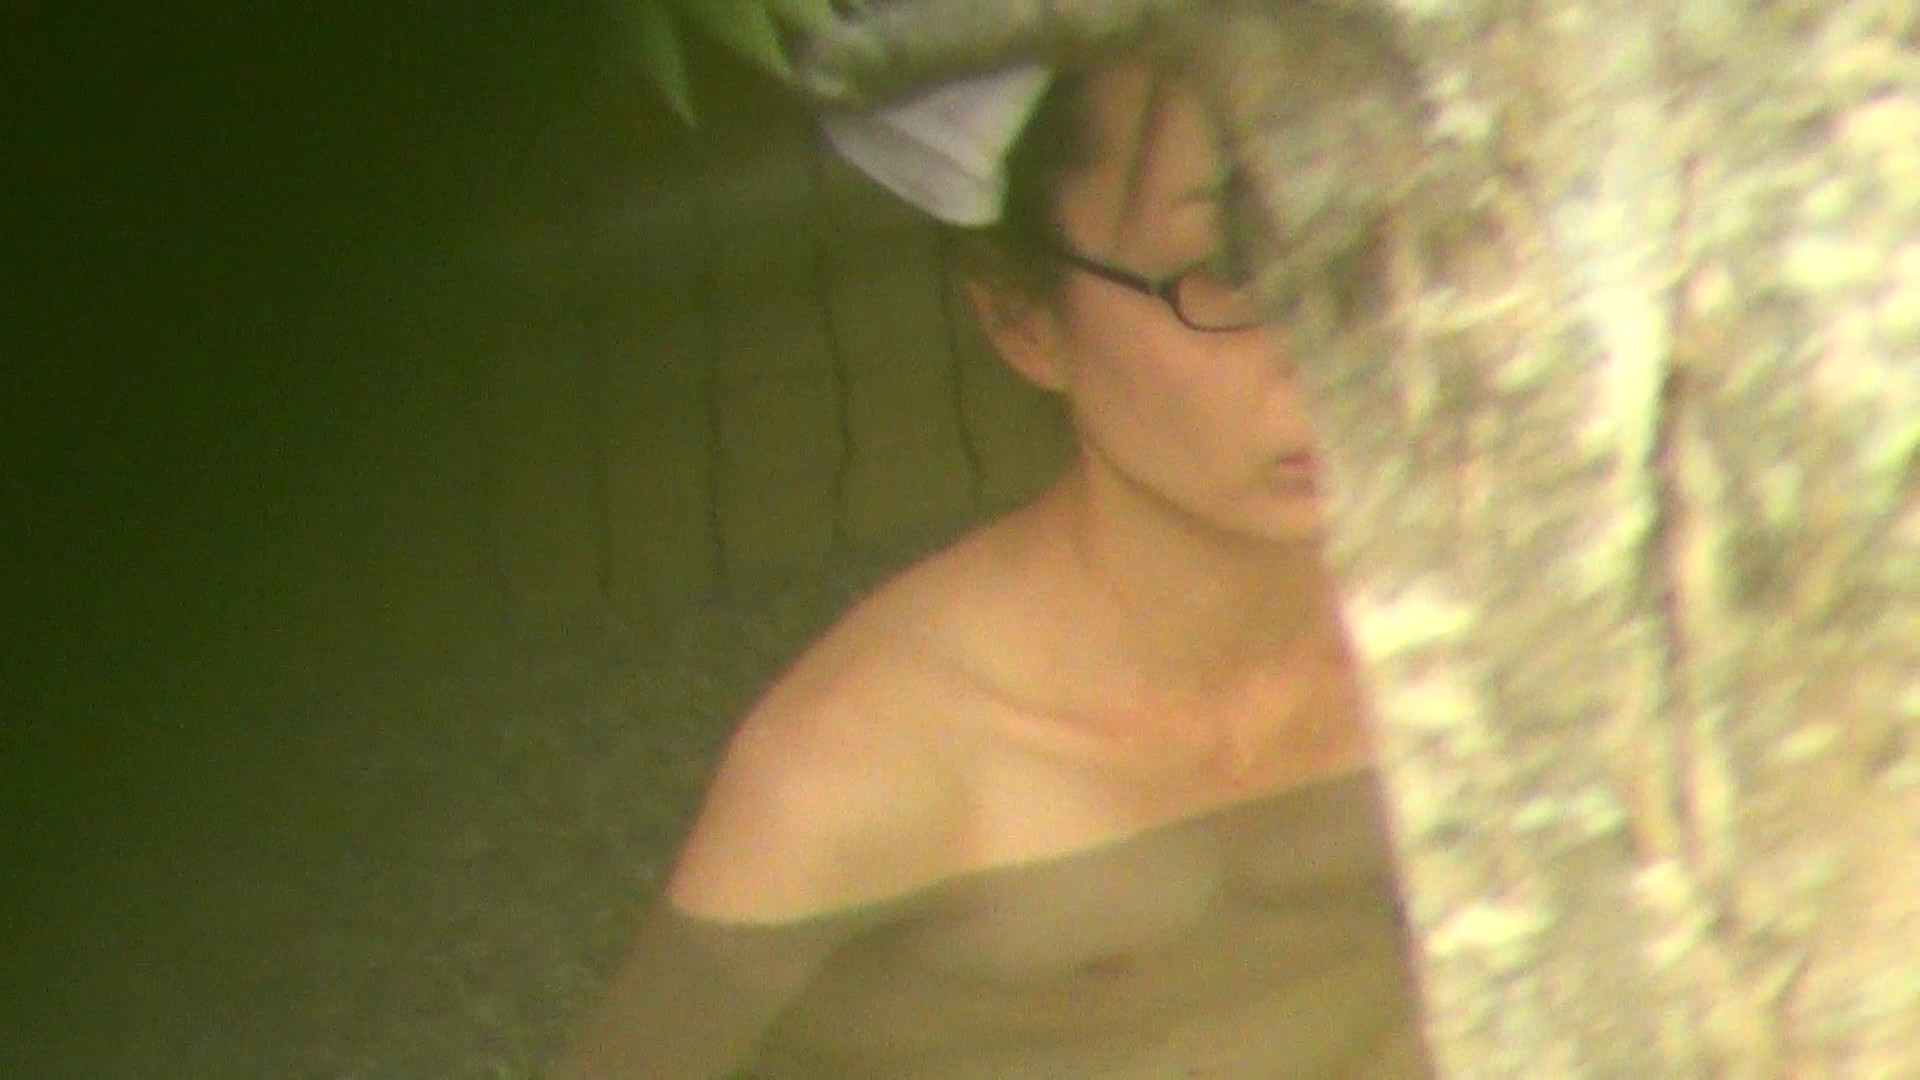 Aquaな露天風呂Vol.232 綺麗なOLたち 盗み撮り動画キャプチャ 50枚 26